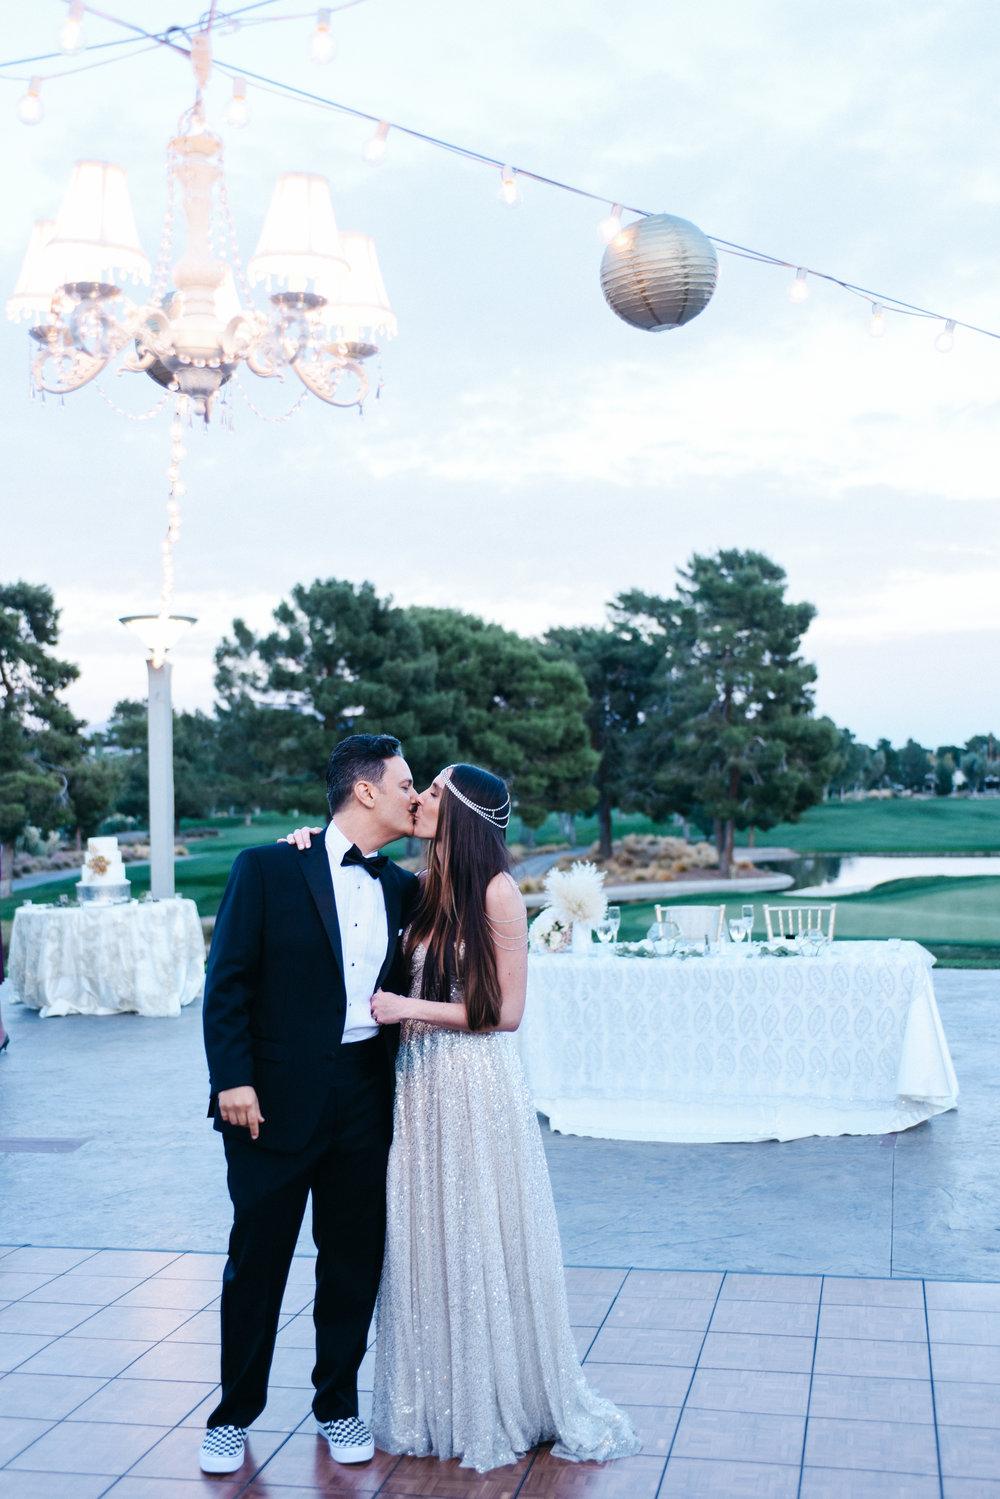 wedding cake, wedding cake details, gold wedding cake,Fall wedding, Newlyweds, bride and groom,Las Vegas Country Club Wedding, Golf course wedding, Las Vegas Wedding, Lifestyle Photography, Sunset wedding, Fall wedding, Flora Pop Wedding,